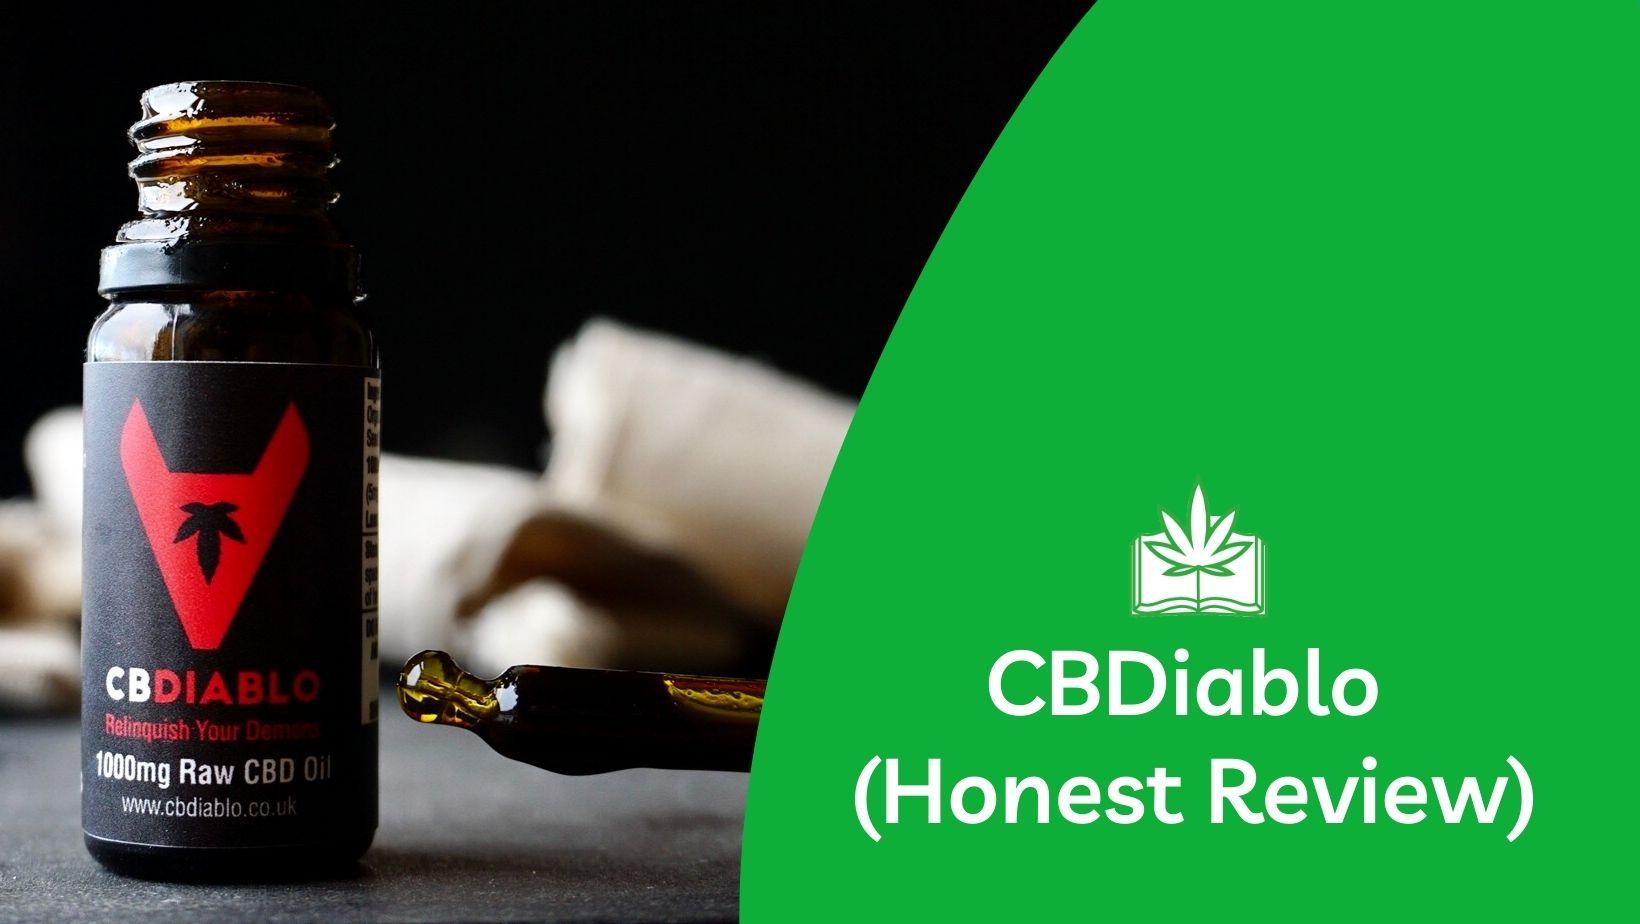 CBDiablo CBD Review